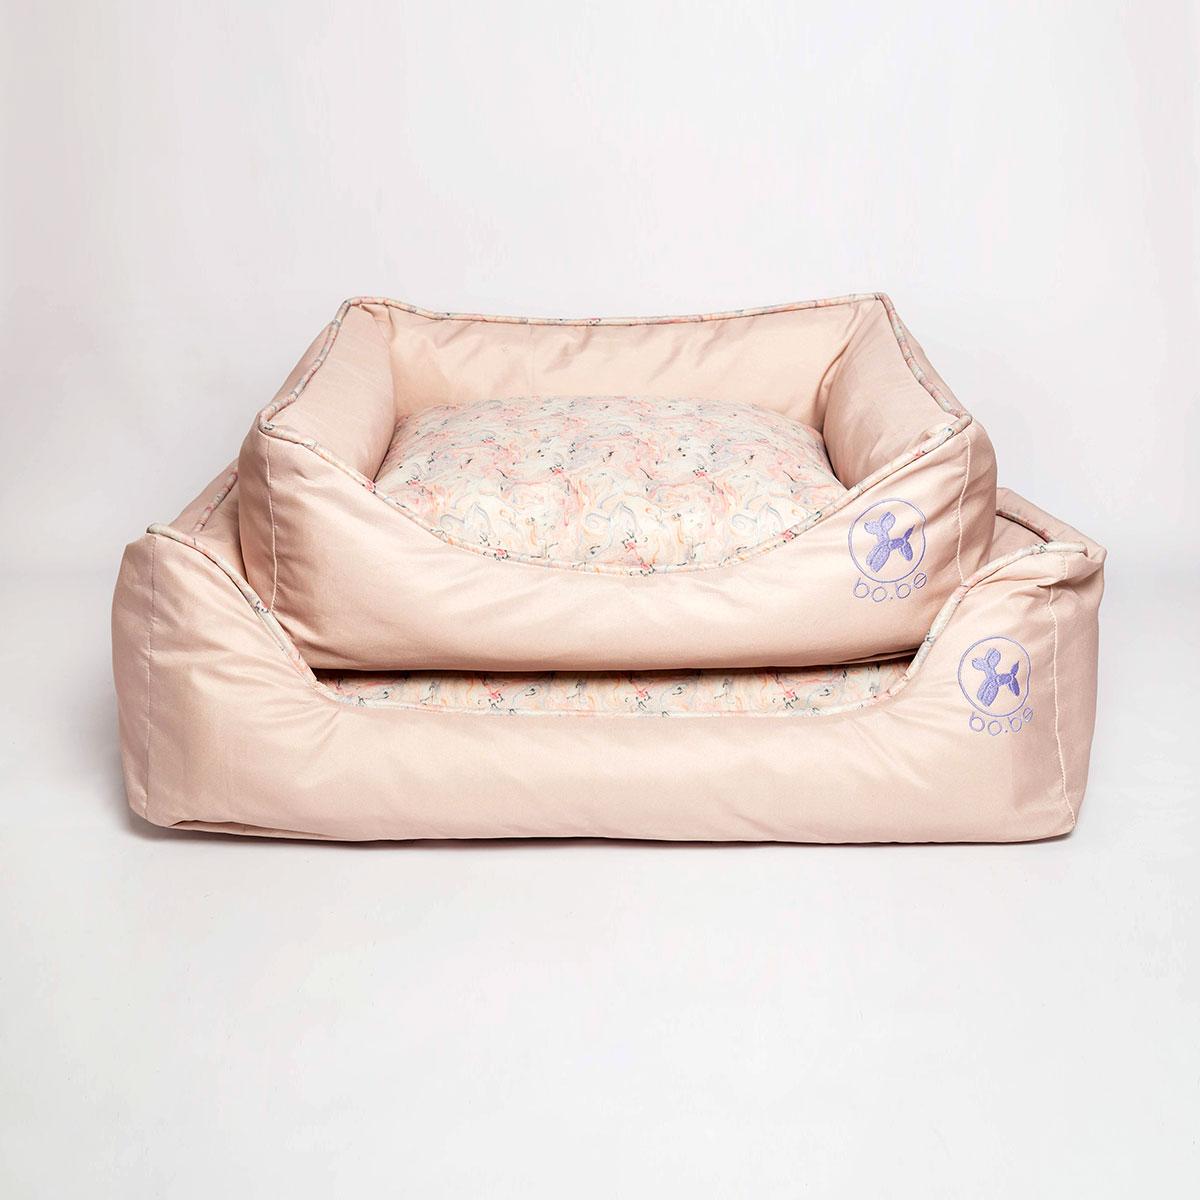 Cama Retangular Bo.be Marble Pink